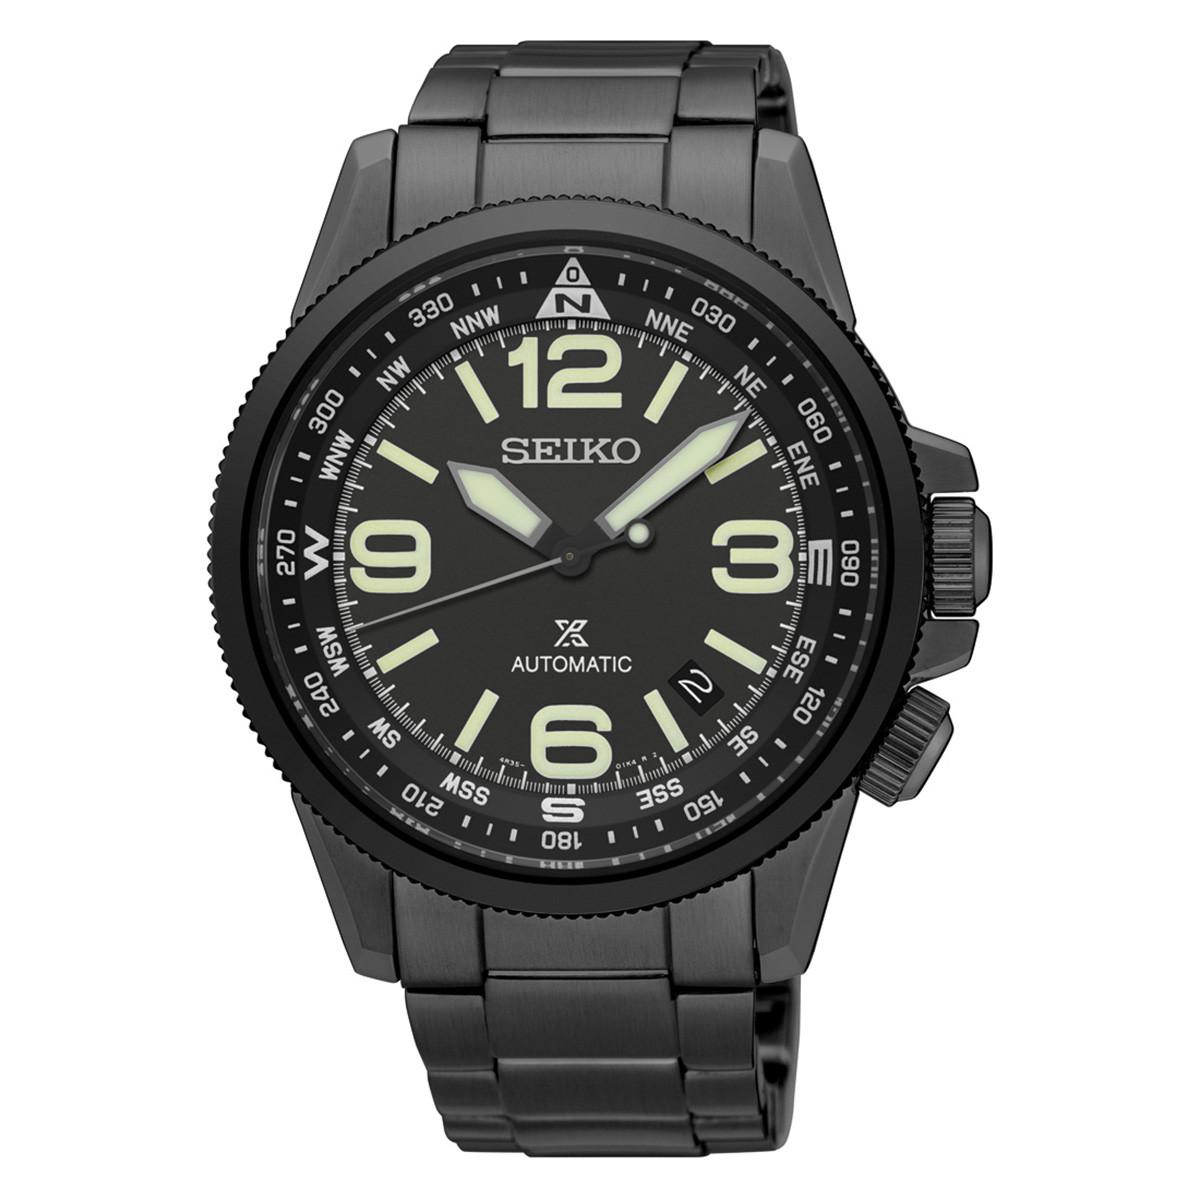 Часы Seiko SRPA73K1 Prospex 4R35 Automatic